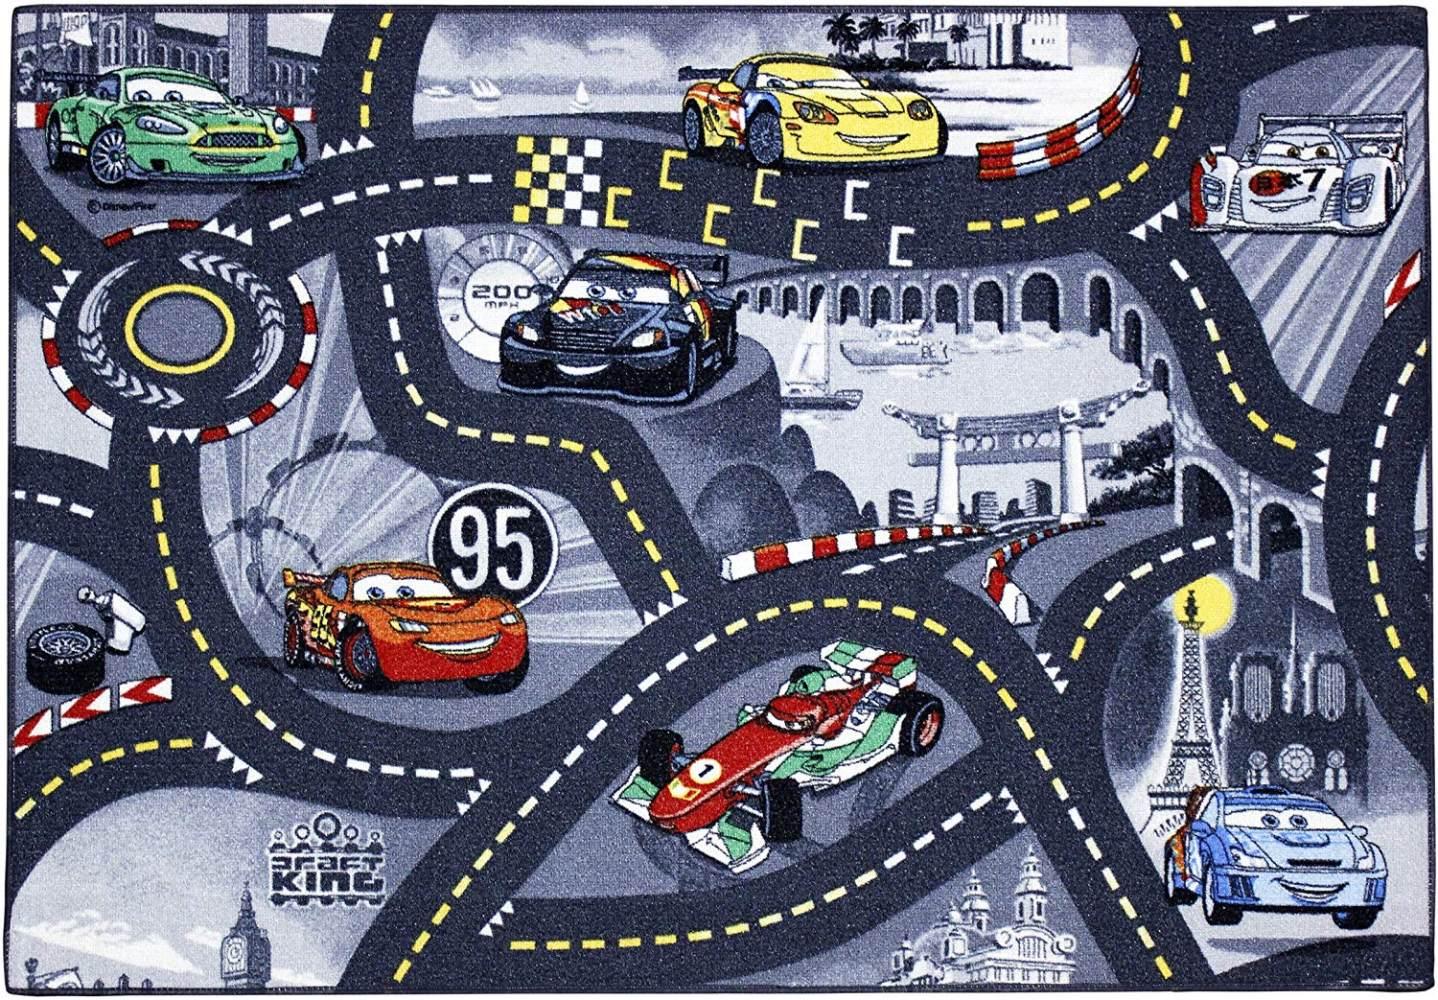 Cars Kinderteppich 95x133 cm Bild 1